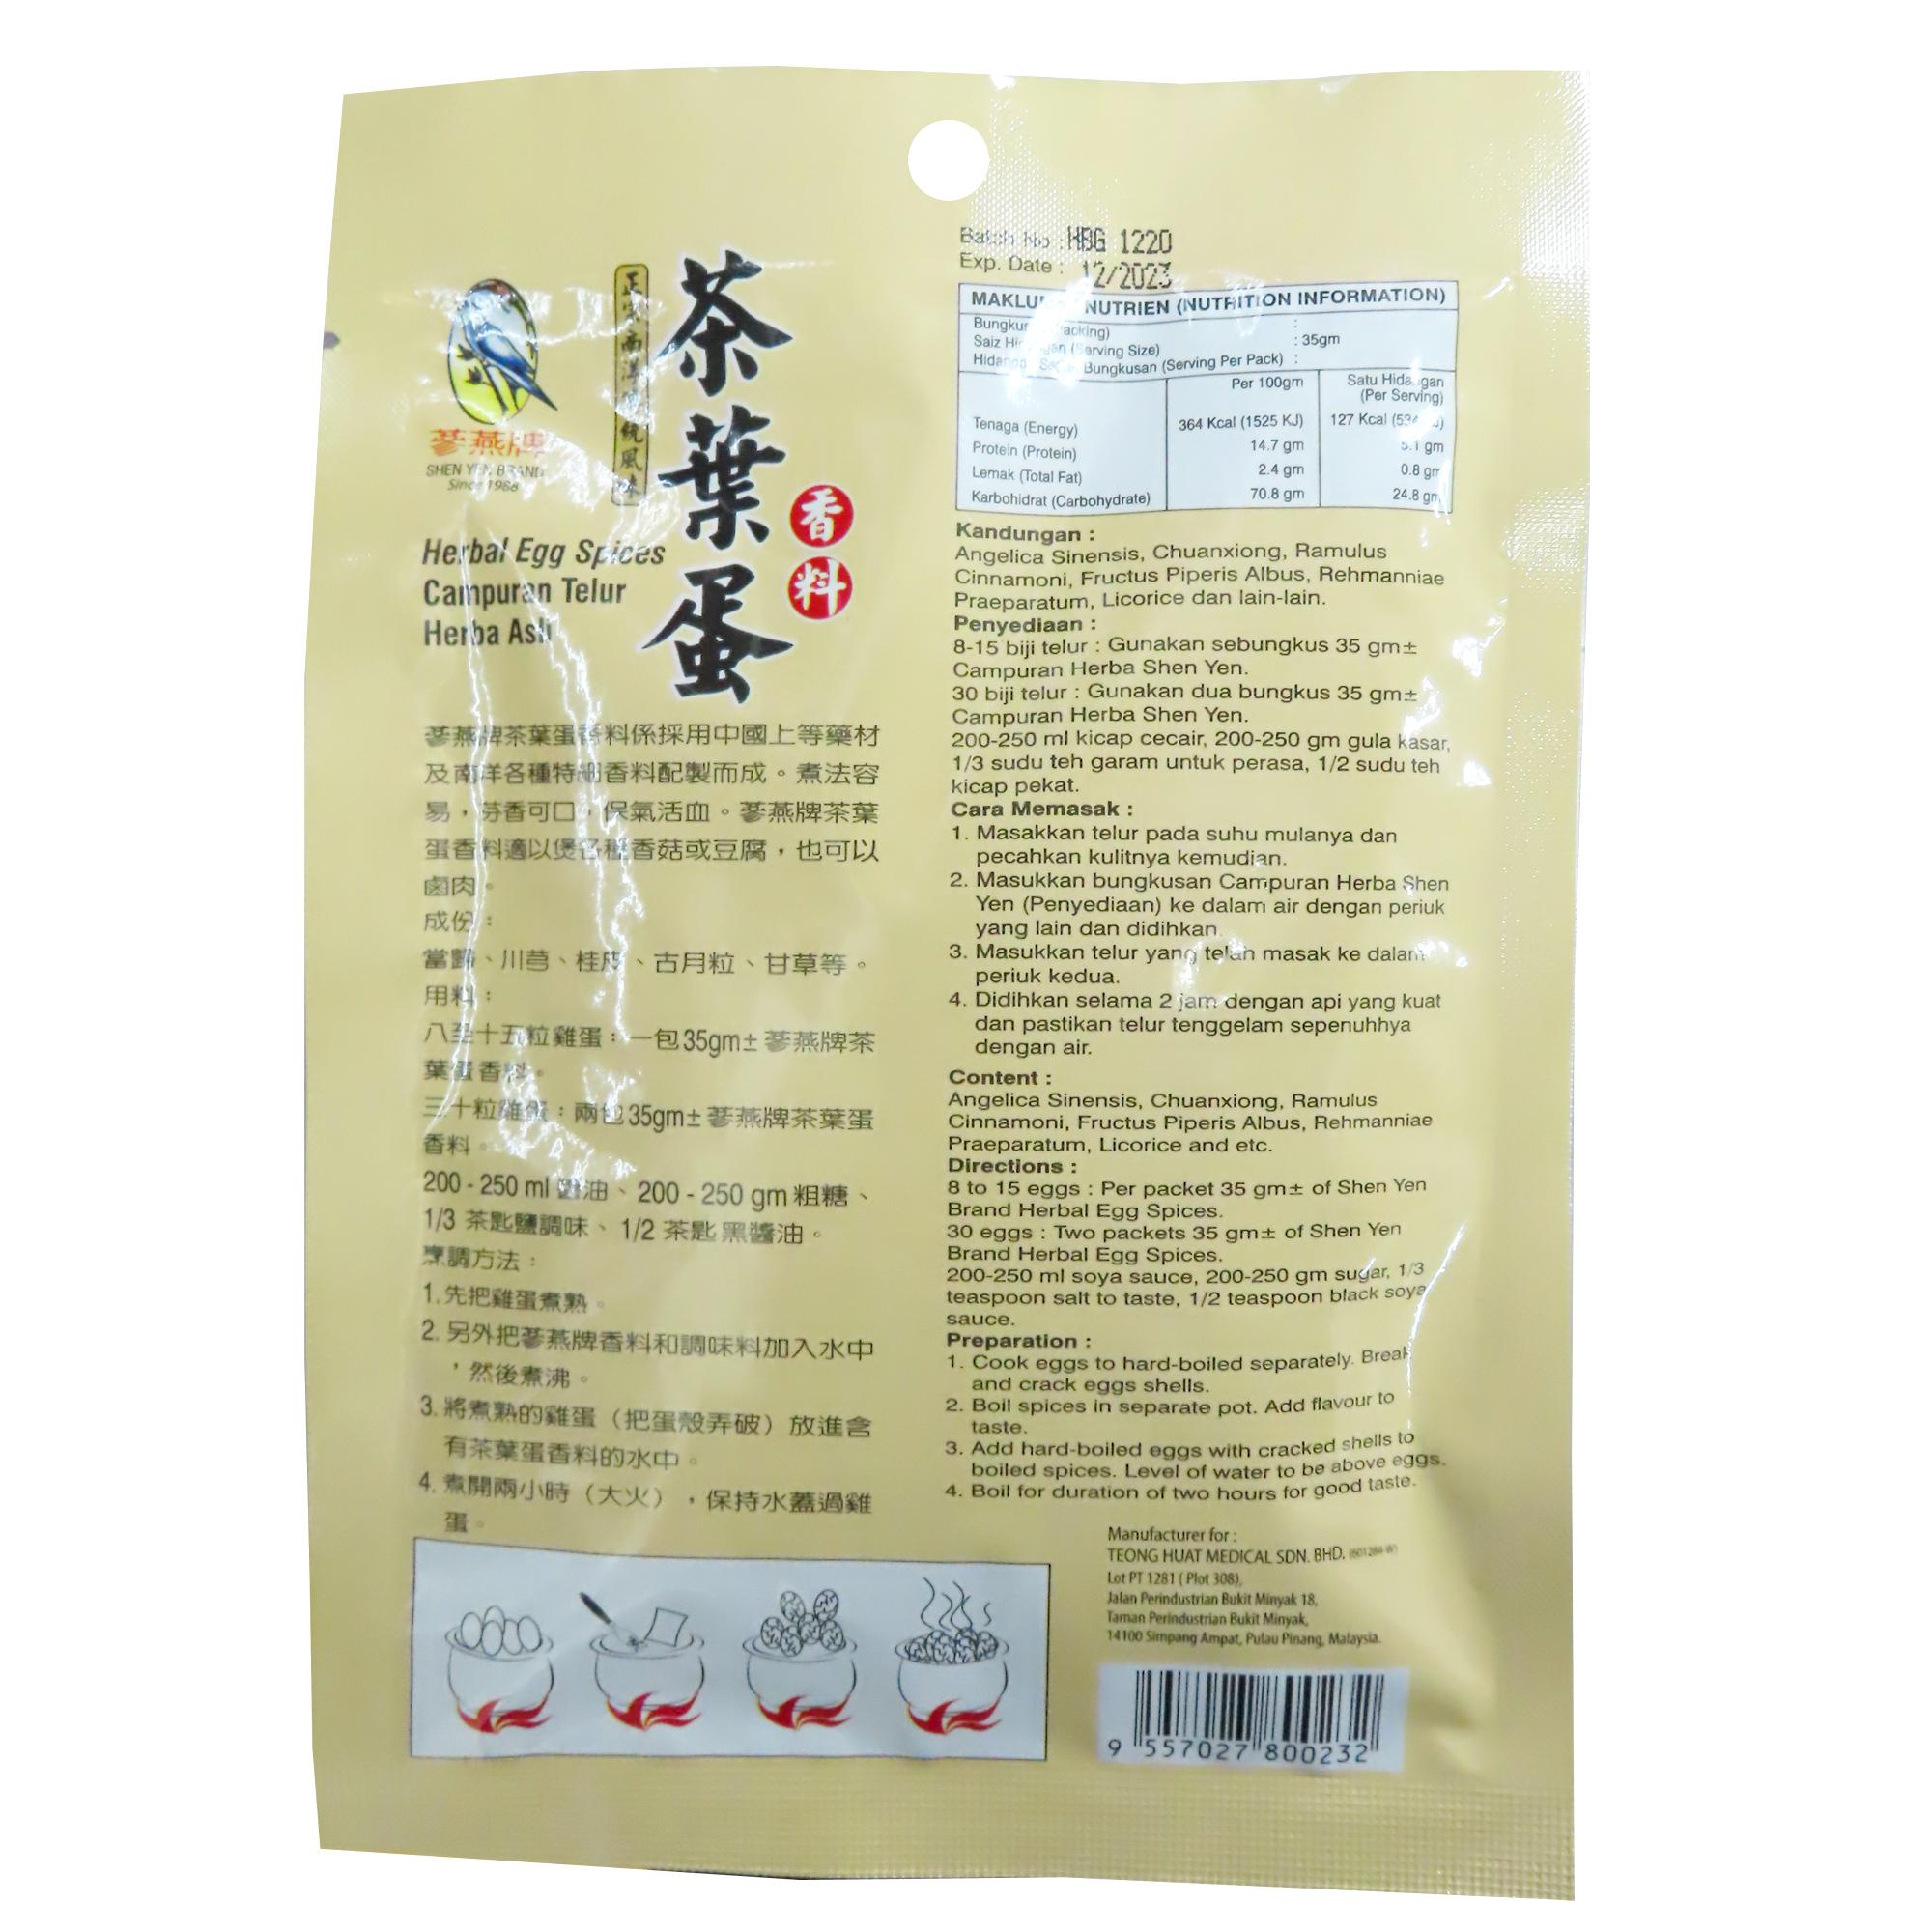 Image Herbal Egg Spices 参燕牌茶叶蛋香料 70grams